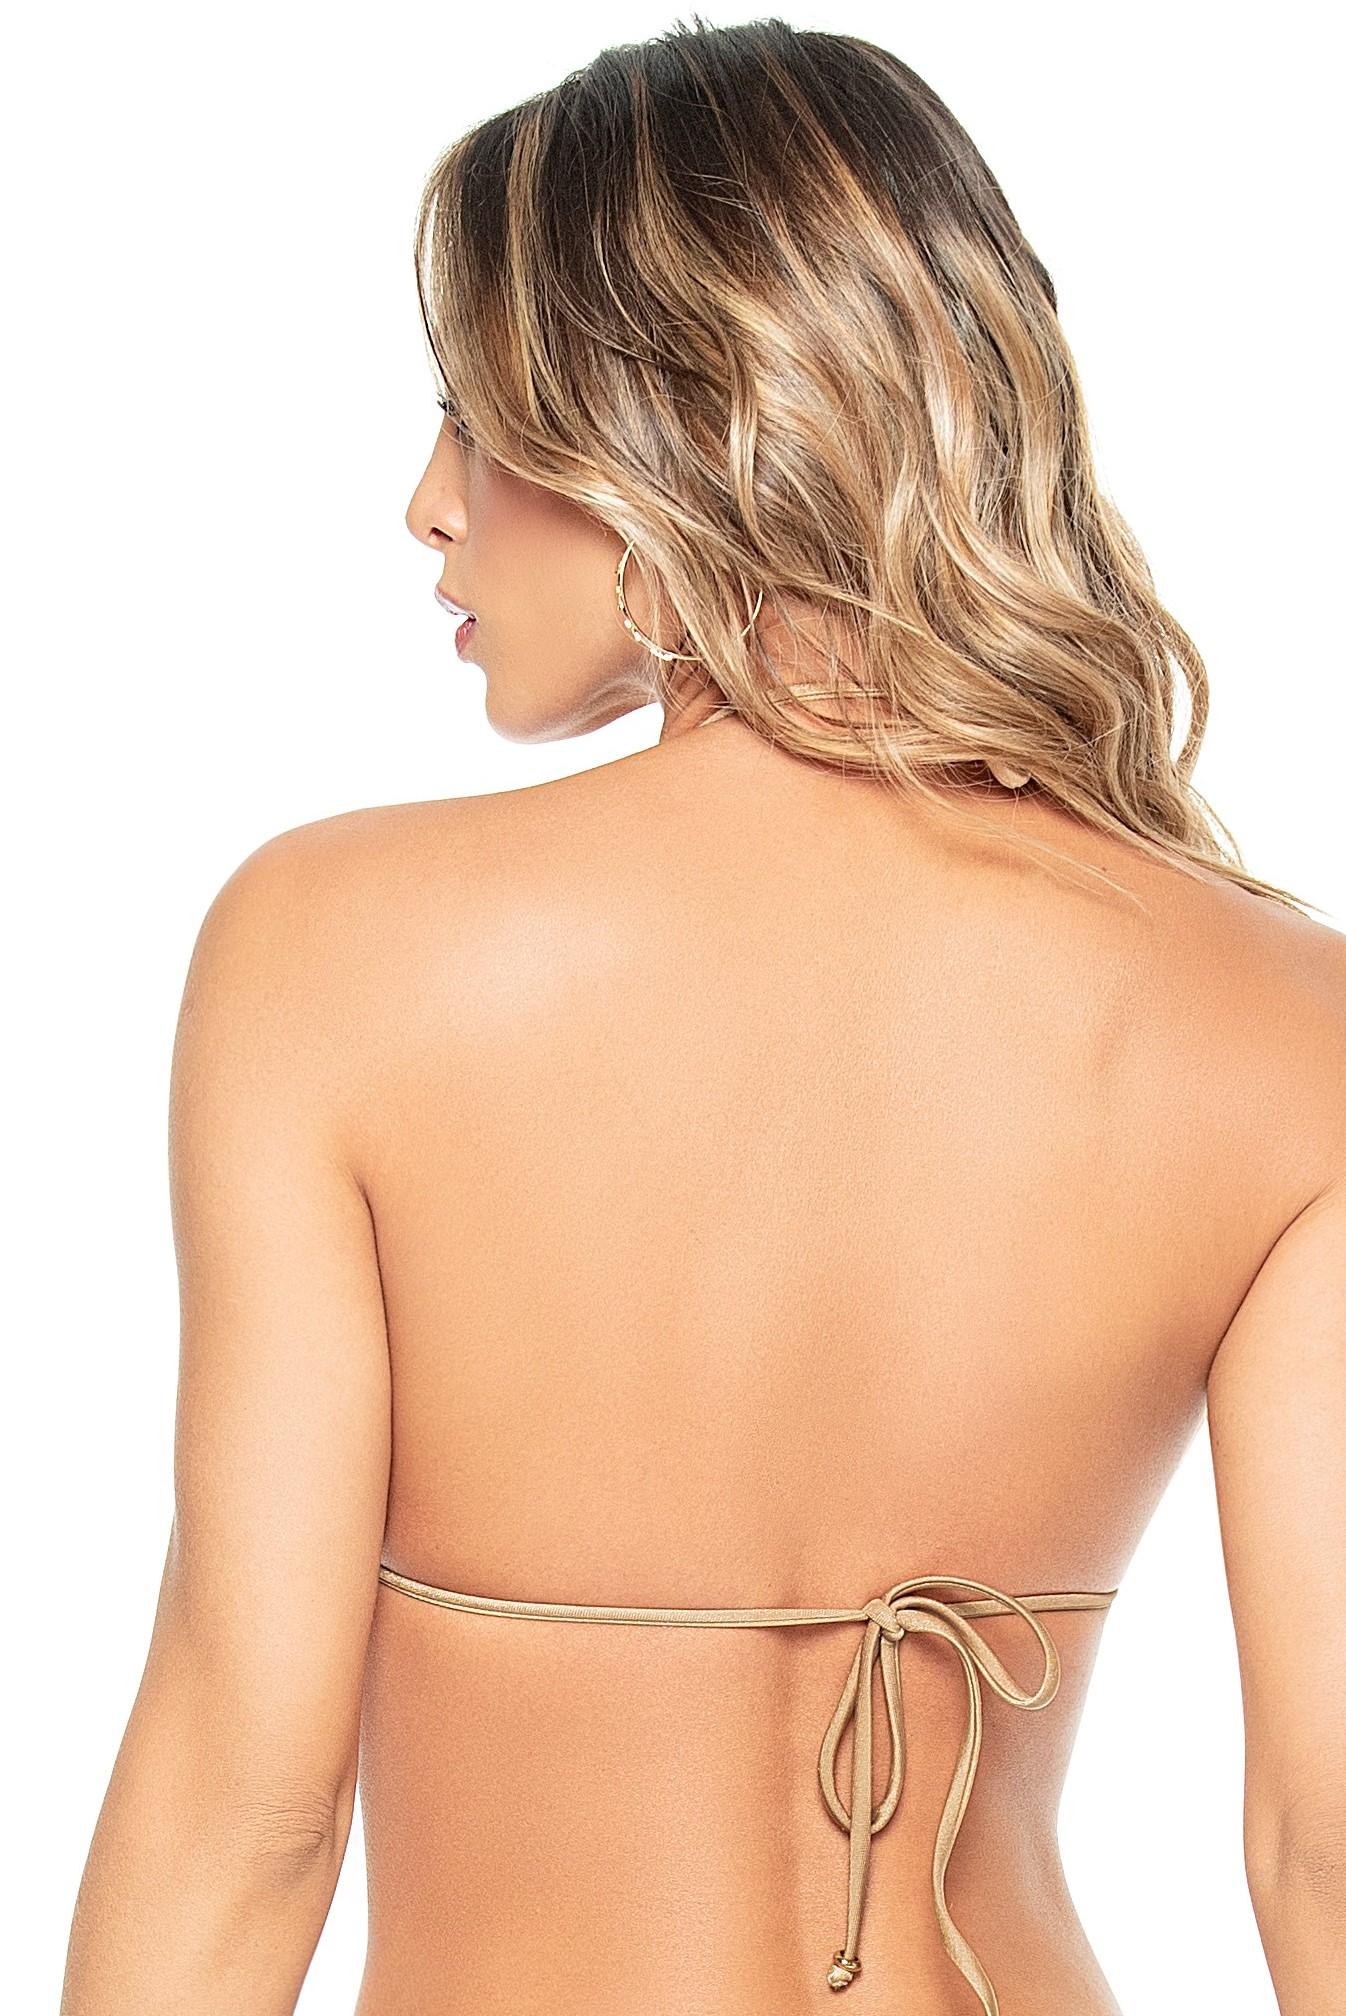 Phax Bella Brasil Golden Triangle Bikini Top